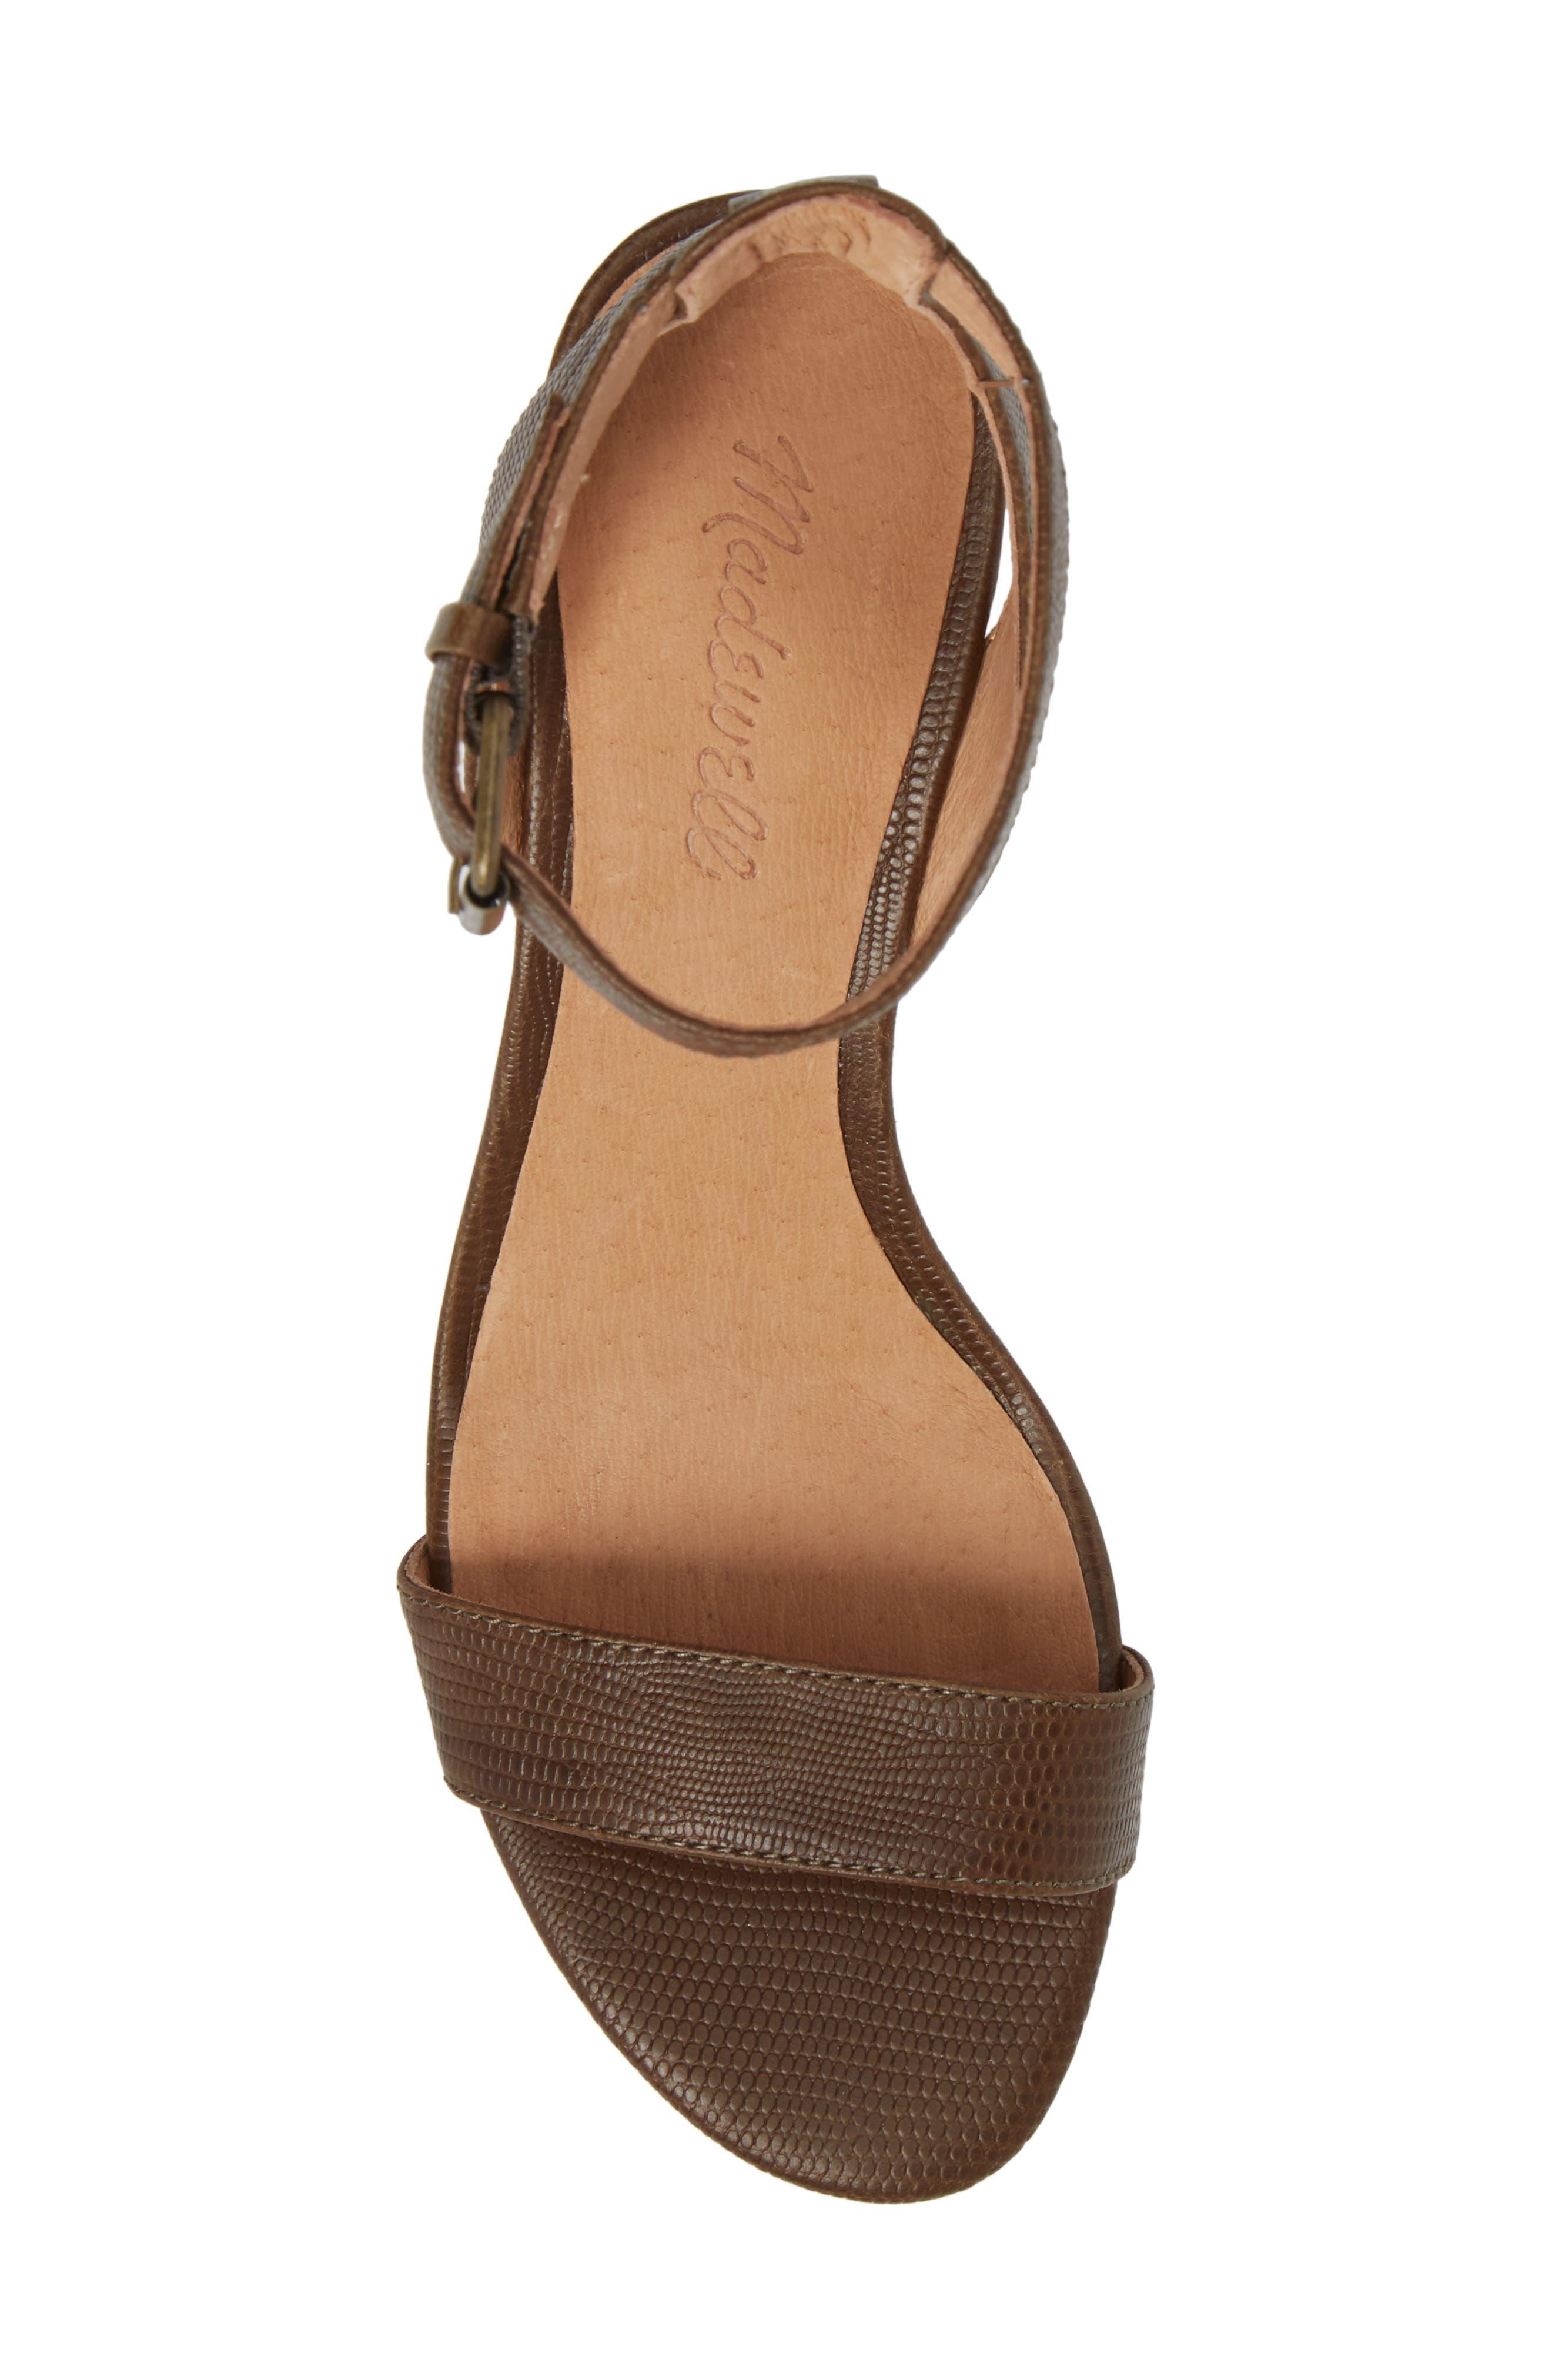 Alice Embossed Ankle Wrap Sandal,                             Alternate thumbnail 5, color,                             Safari Khaki Leather